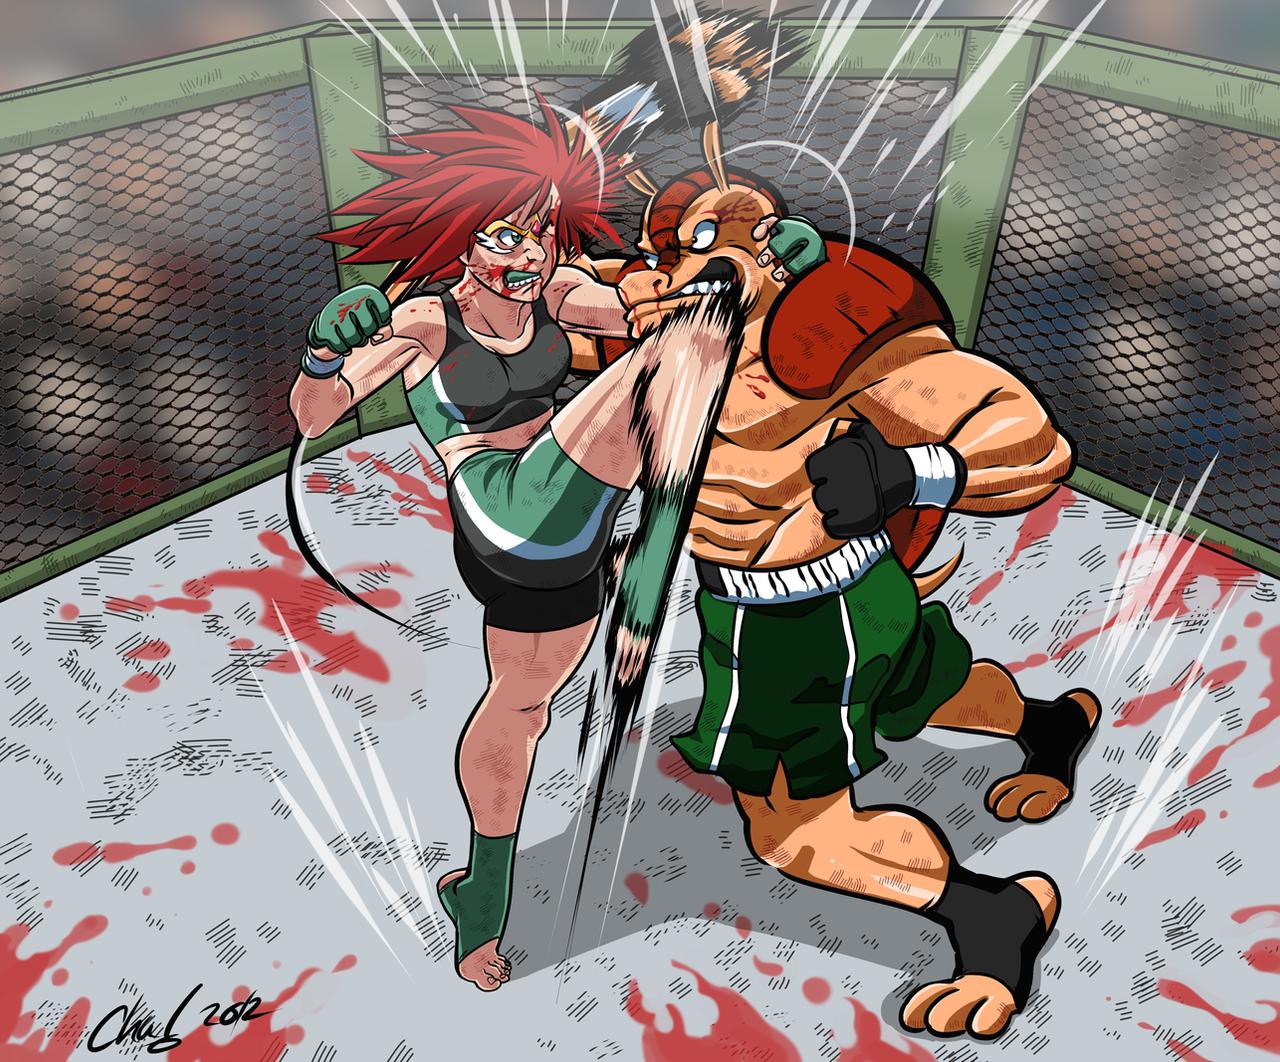 Amazon E Hentai bc fight hentai game